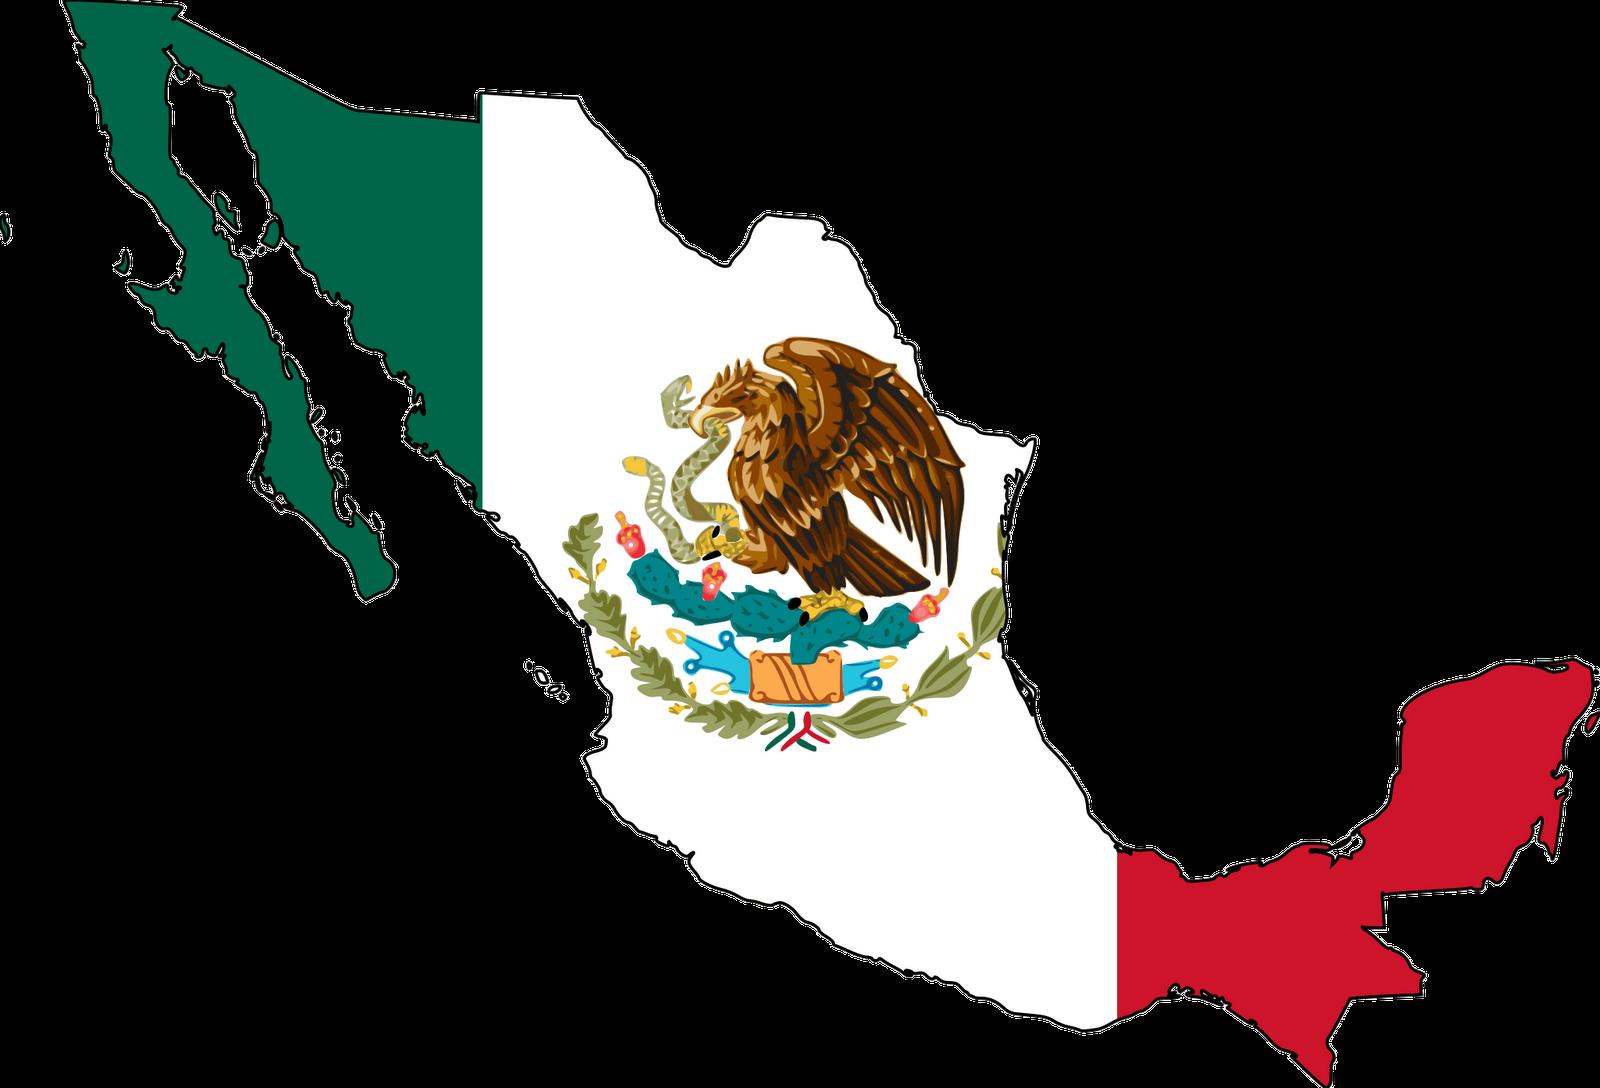 free clip art maps mexico flag 071511 clip art m xico rh pinterest com mexico flag clipart black and white mexico flag clipart